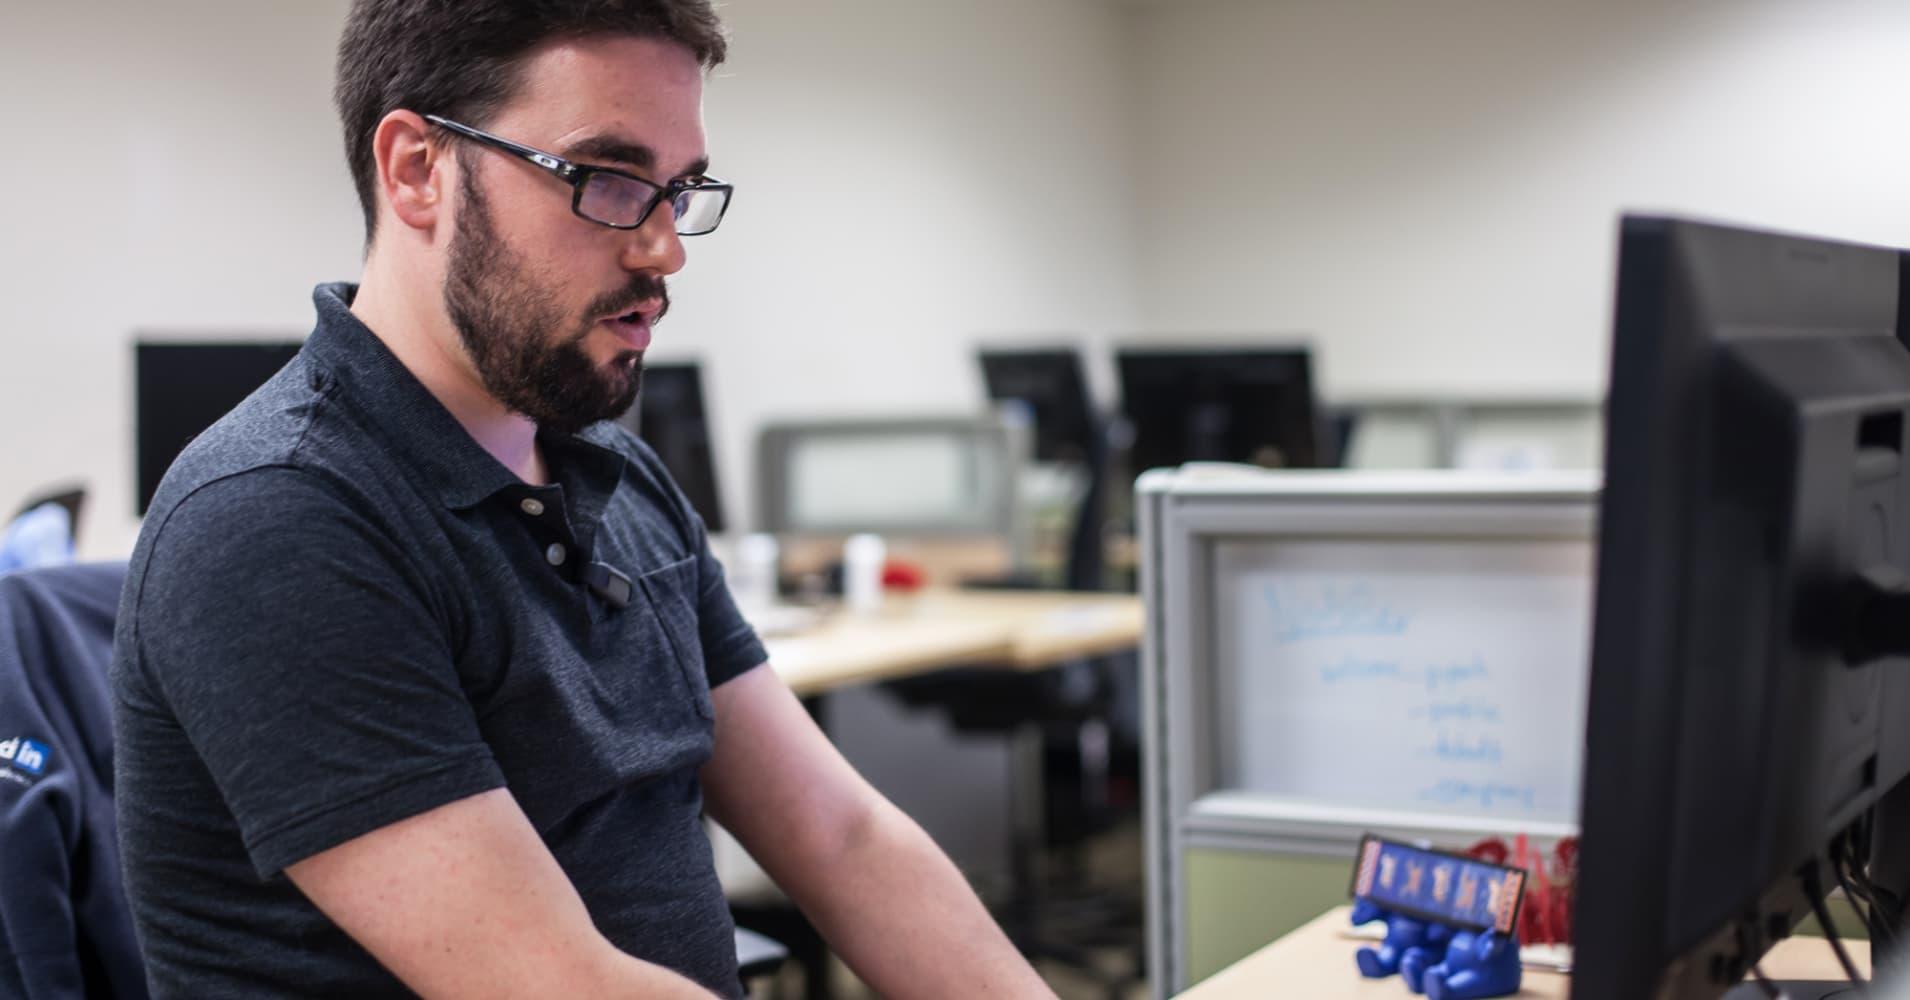 Jerrod Lowmaster, LinkedIn data scientist